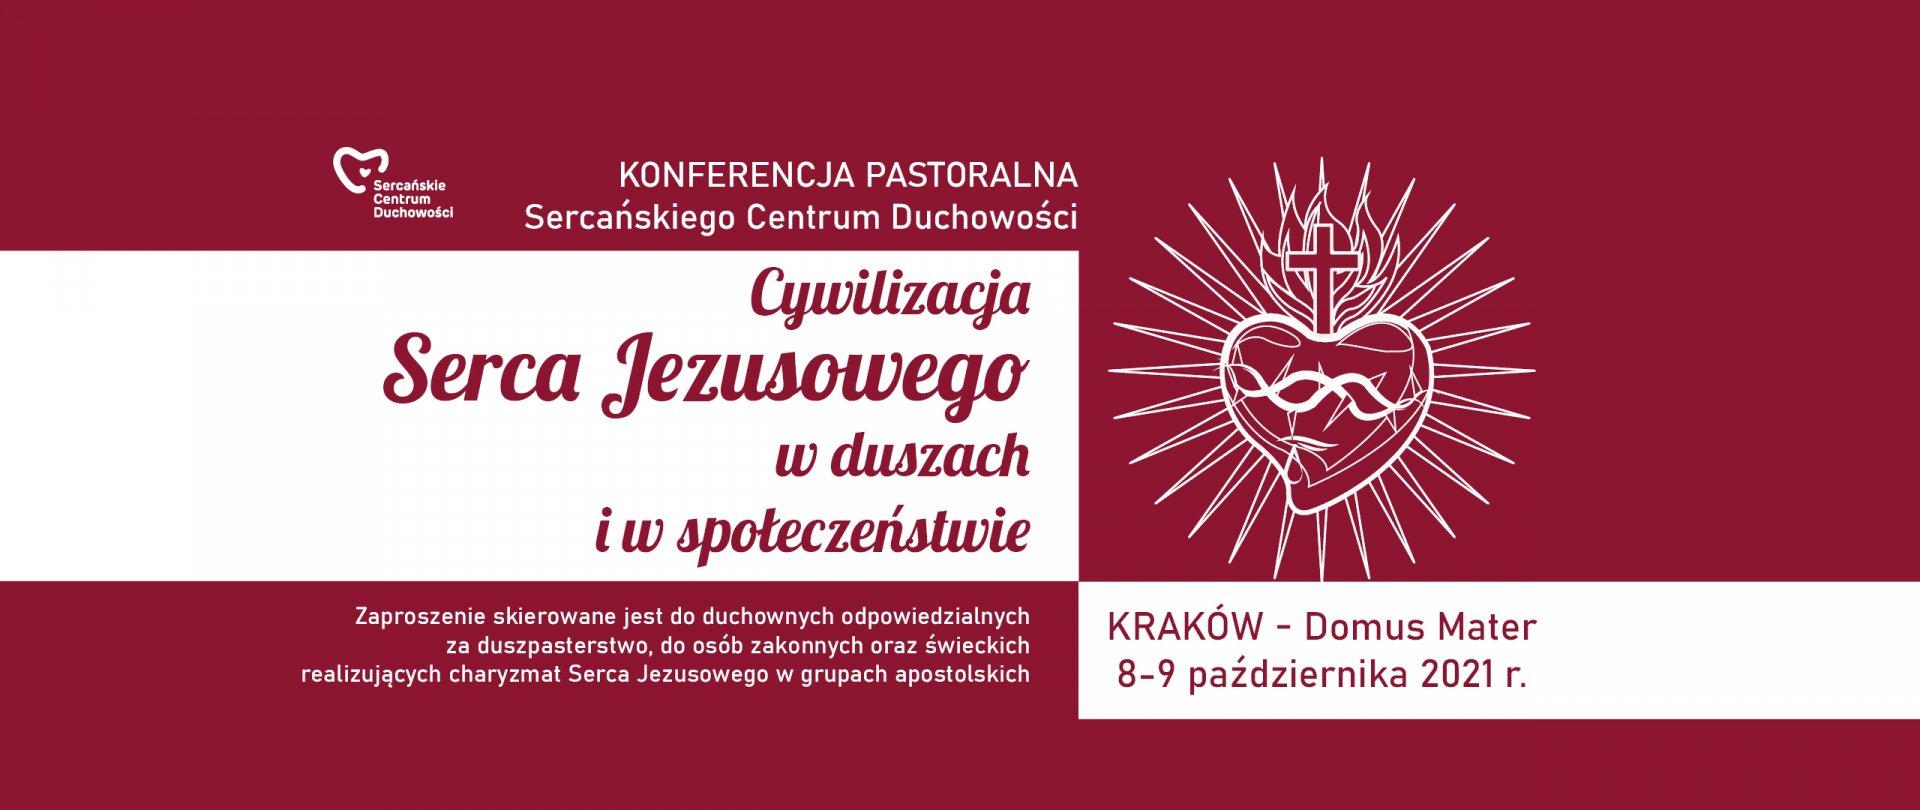 Konferencja Pastoralna